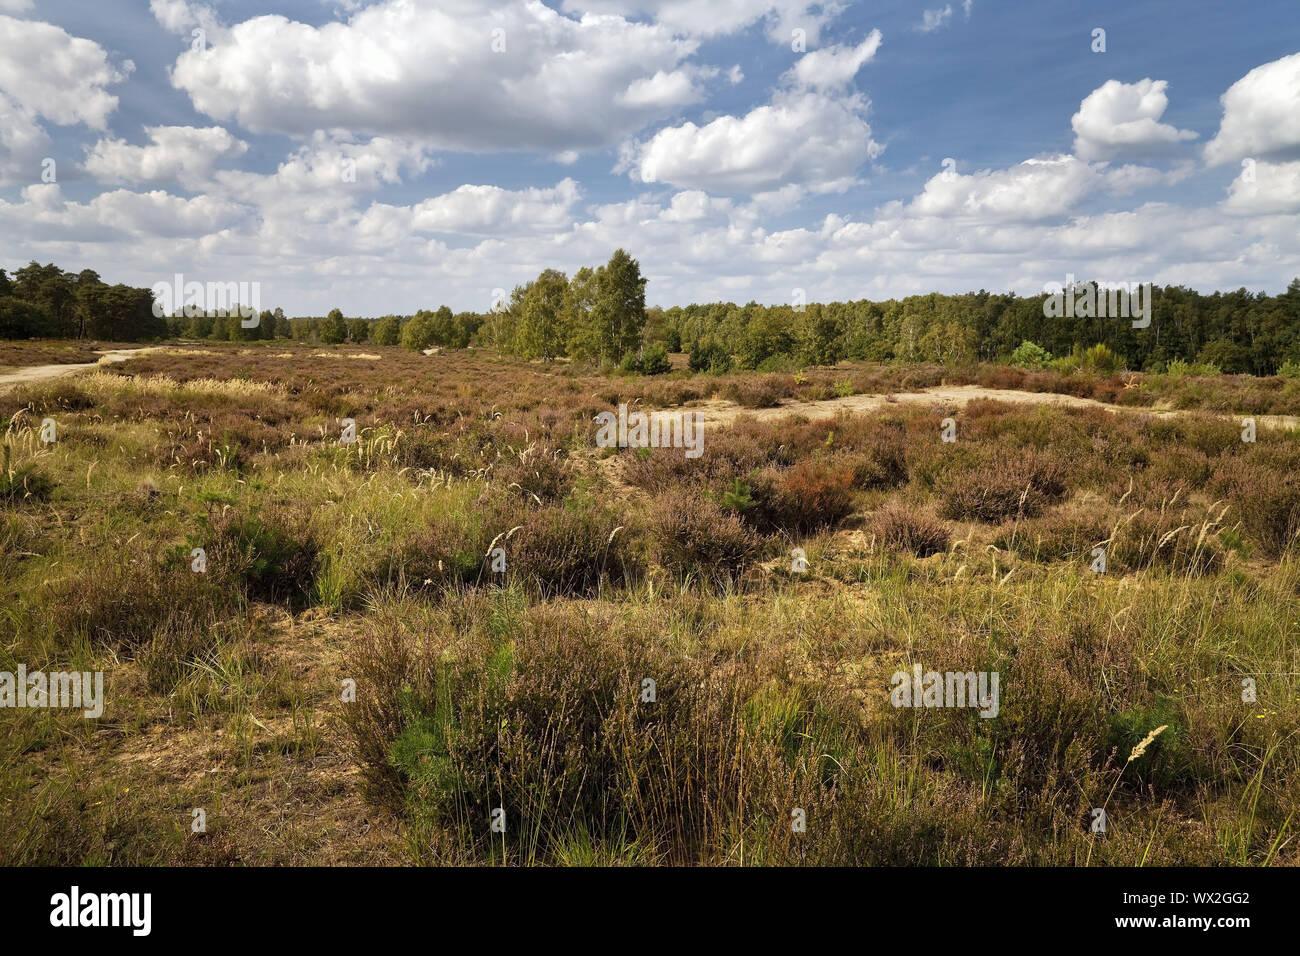 heathland, nature reserve Wahner Heide, Troisdorf, North Rhine-Westphalia, Germany, Europe Stock Photo